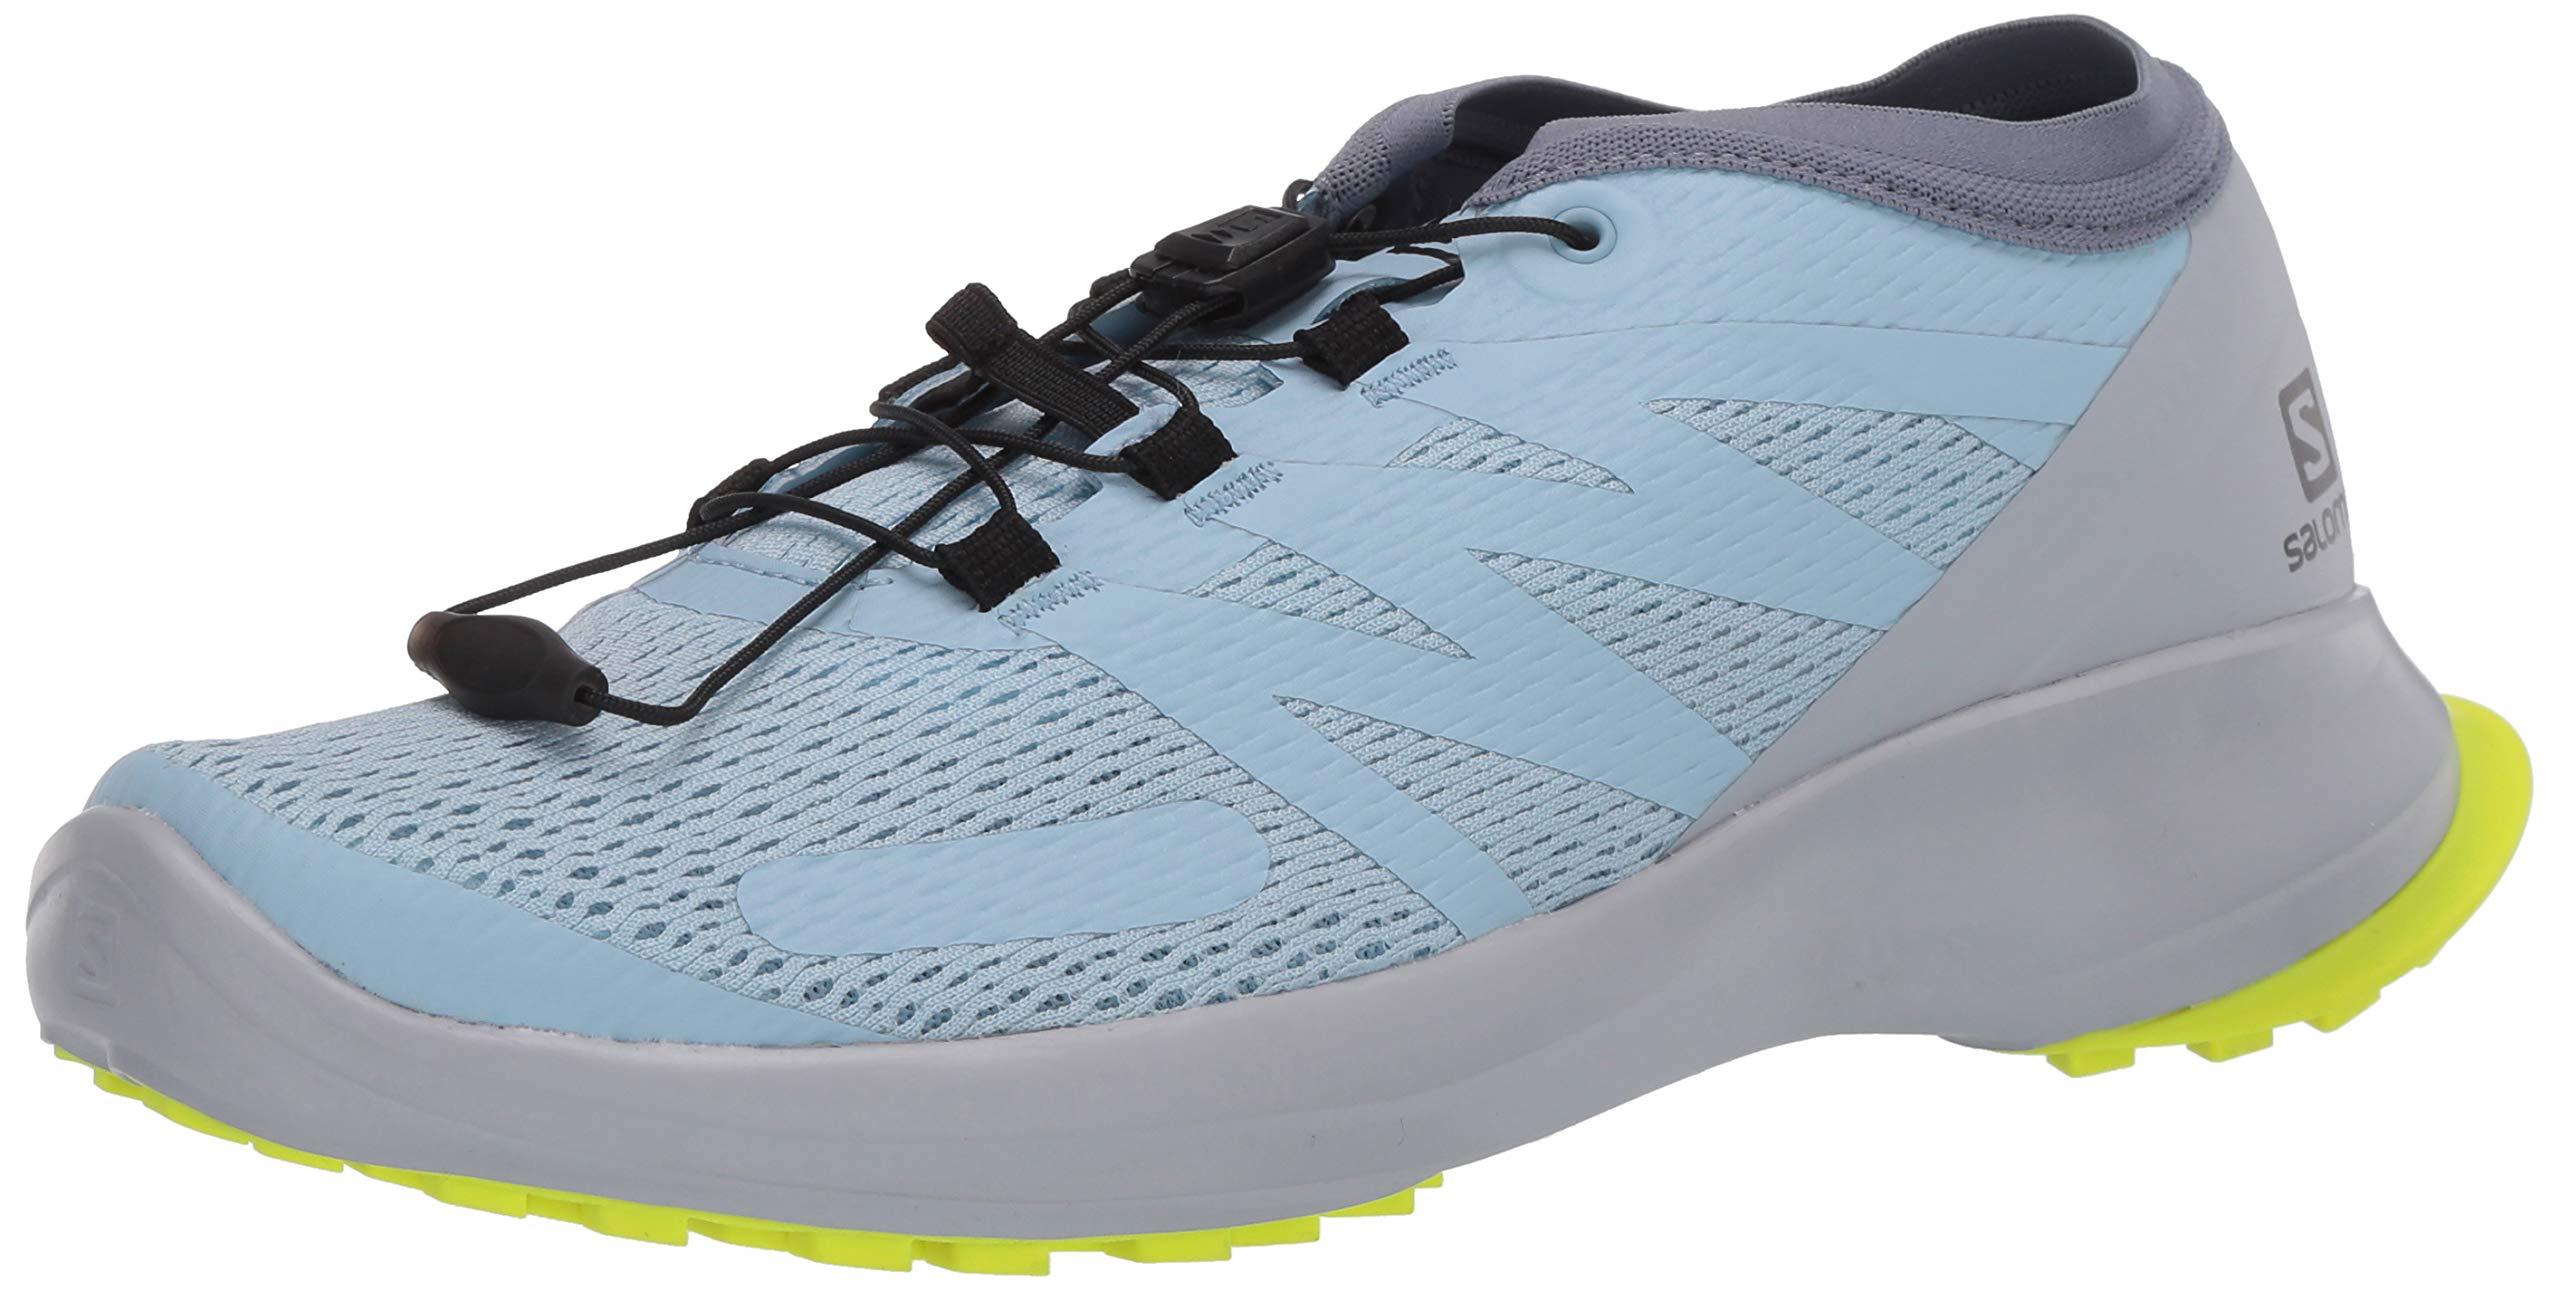 Salomon Damen Shoes Sense Flow Laufschuhe, Weiß (Angel Falls/Pearl Blue/Safety